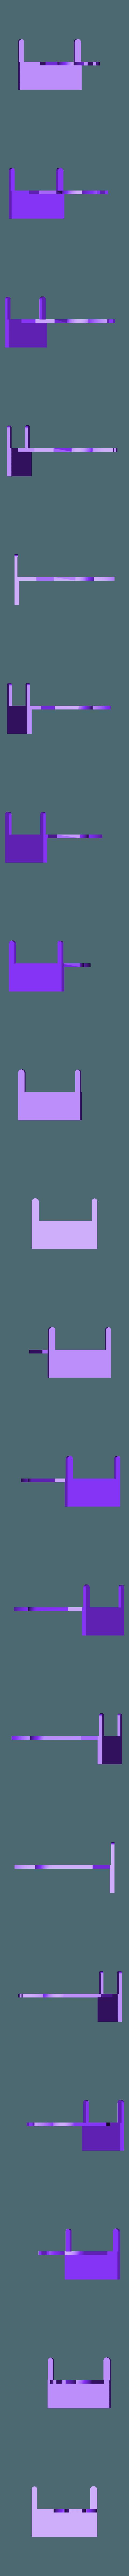 Leg_Right.stl Download free STL file T-Rex Windup Walker • 3D printer model, gzumwalt